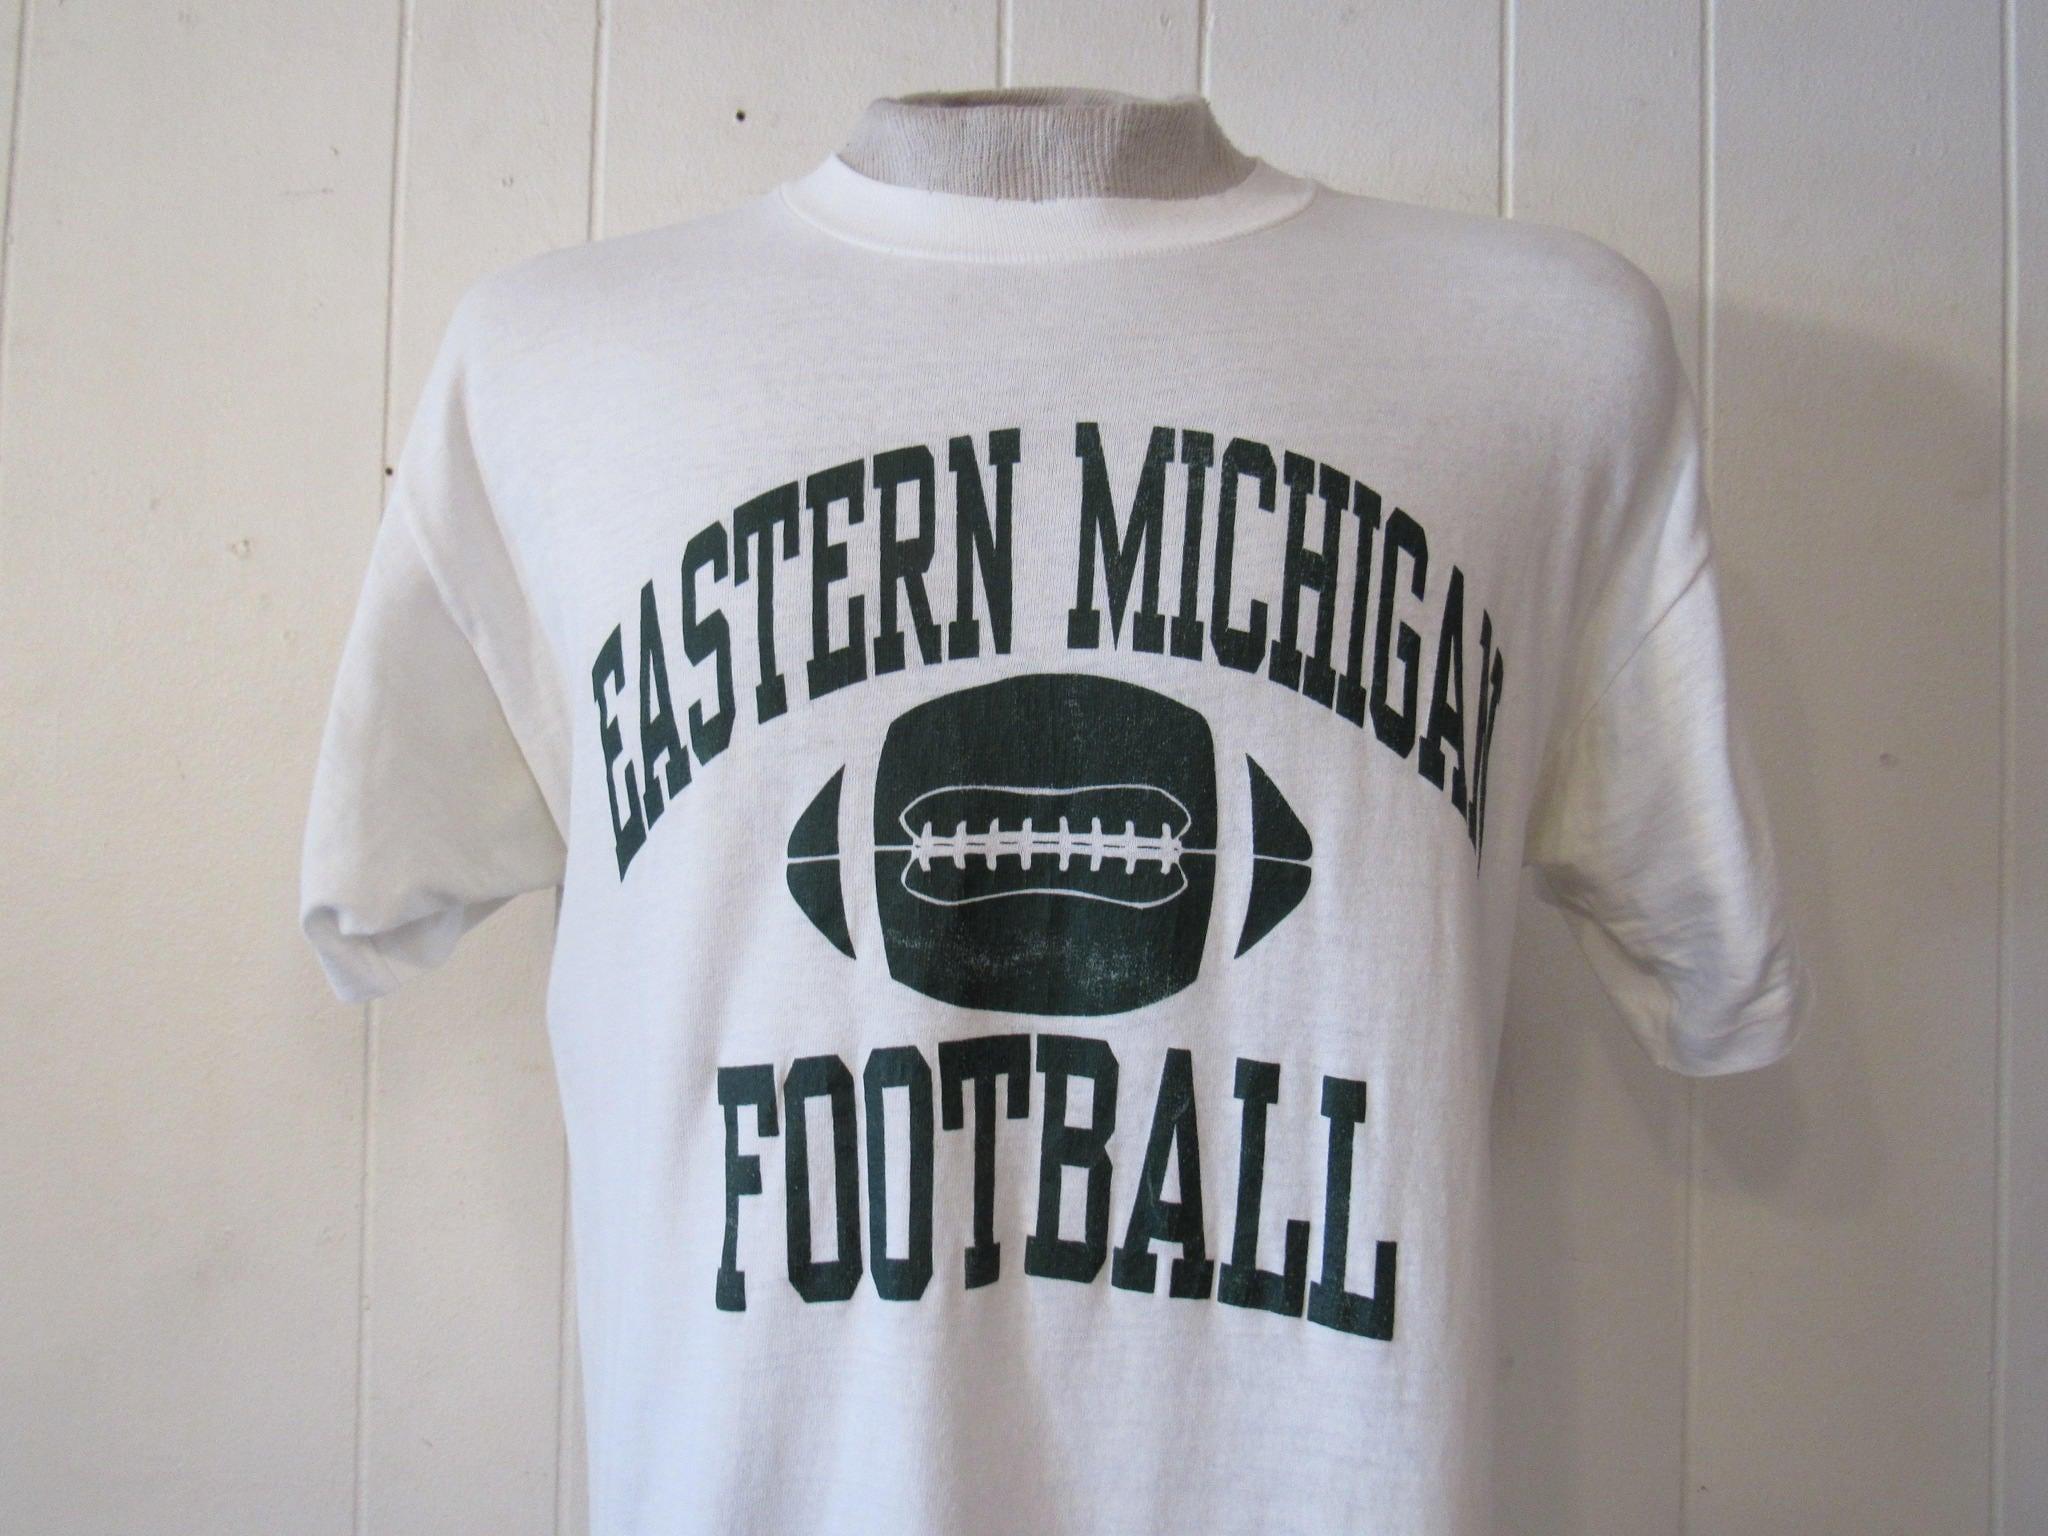 Vintage T Shirt Football T Shirt Eastern Michigan T Shirt Eastern Michigan Football Vintage Clothing Medium LongSleeve Tee